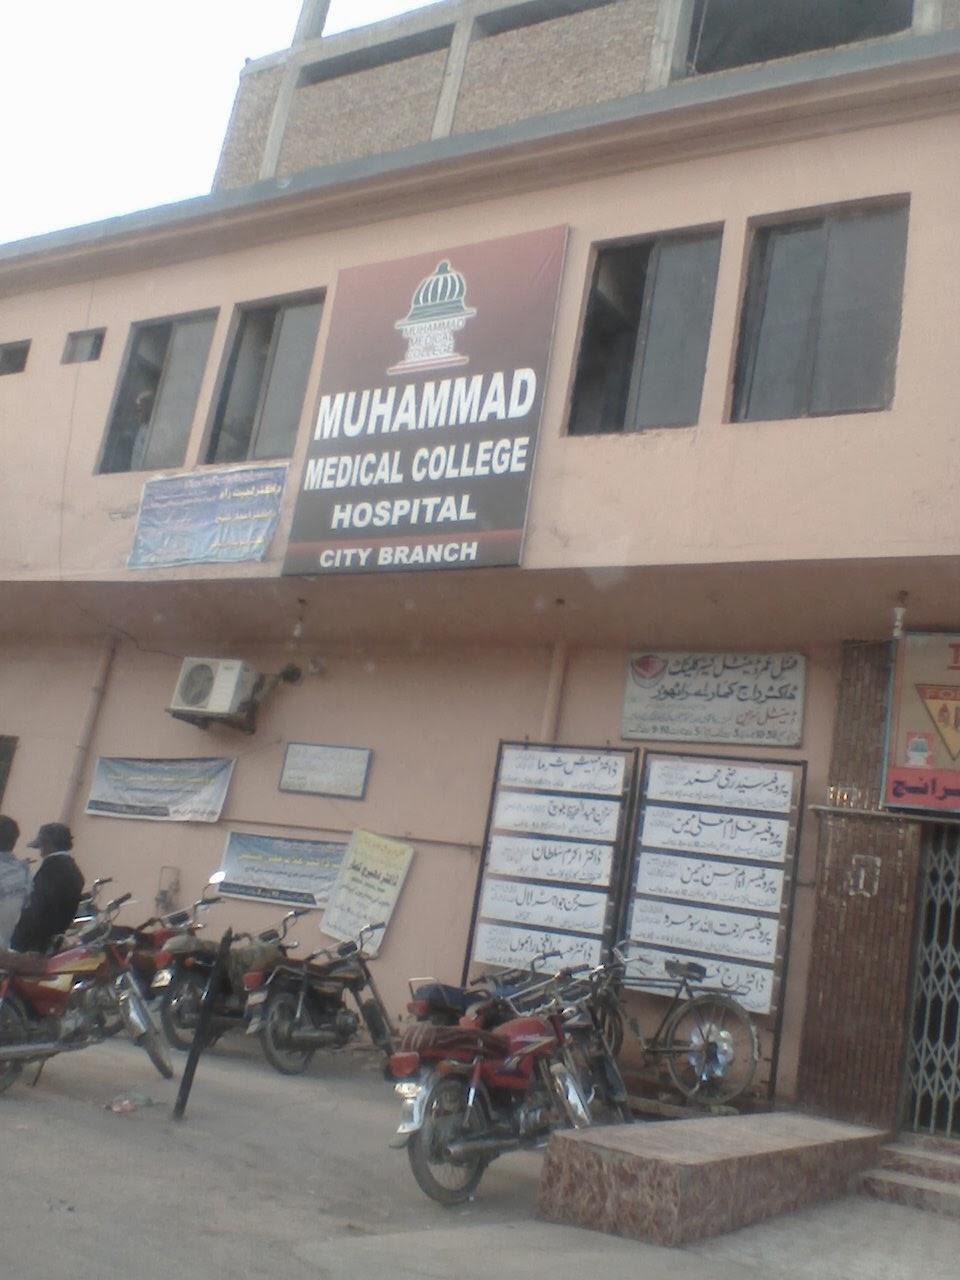 MMC Hospital City Branch